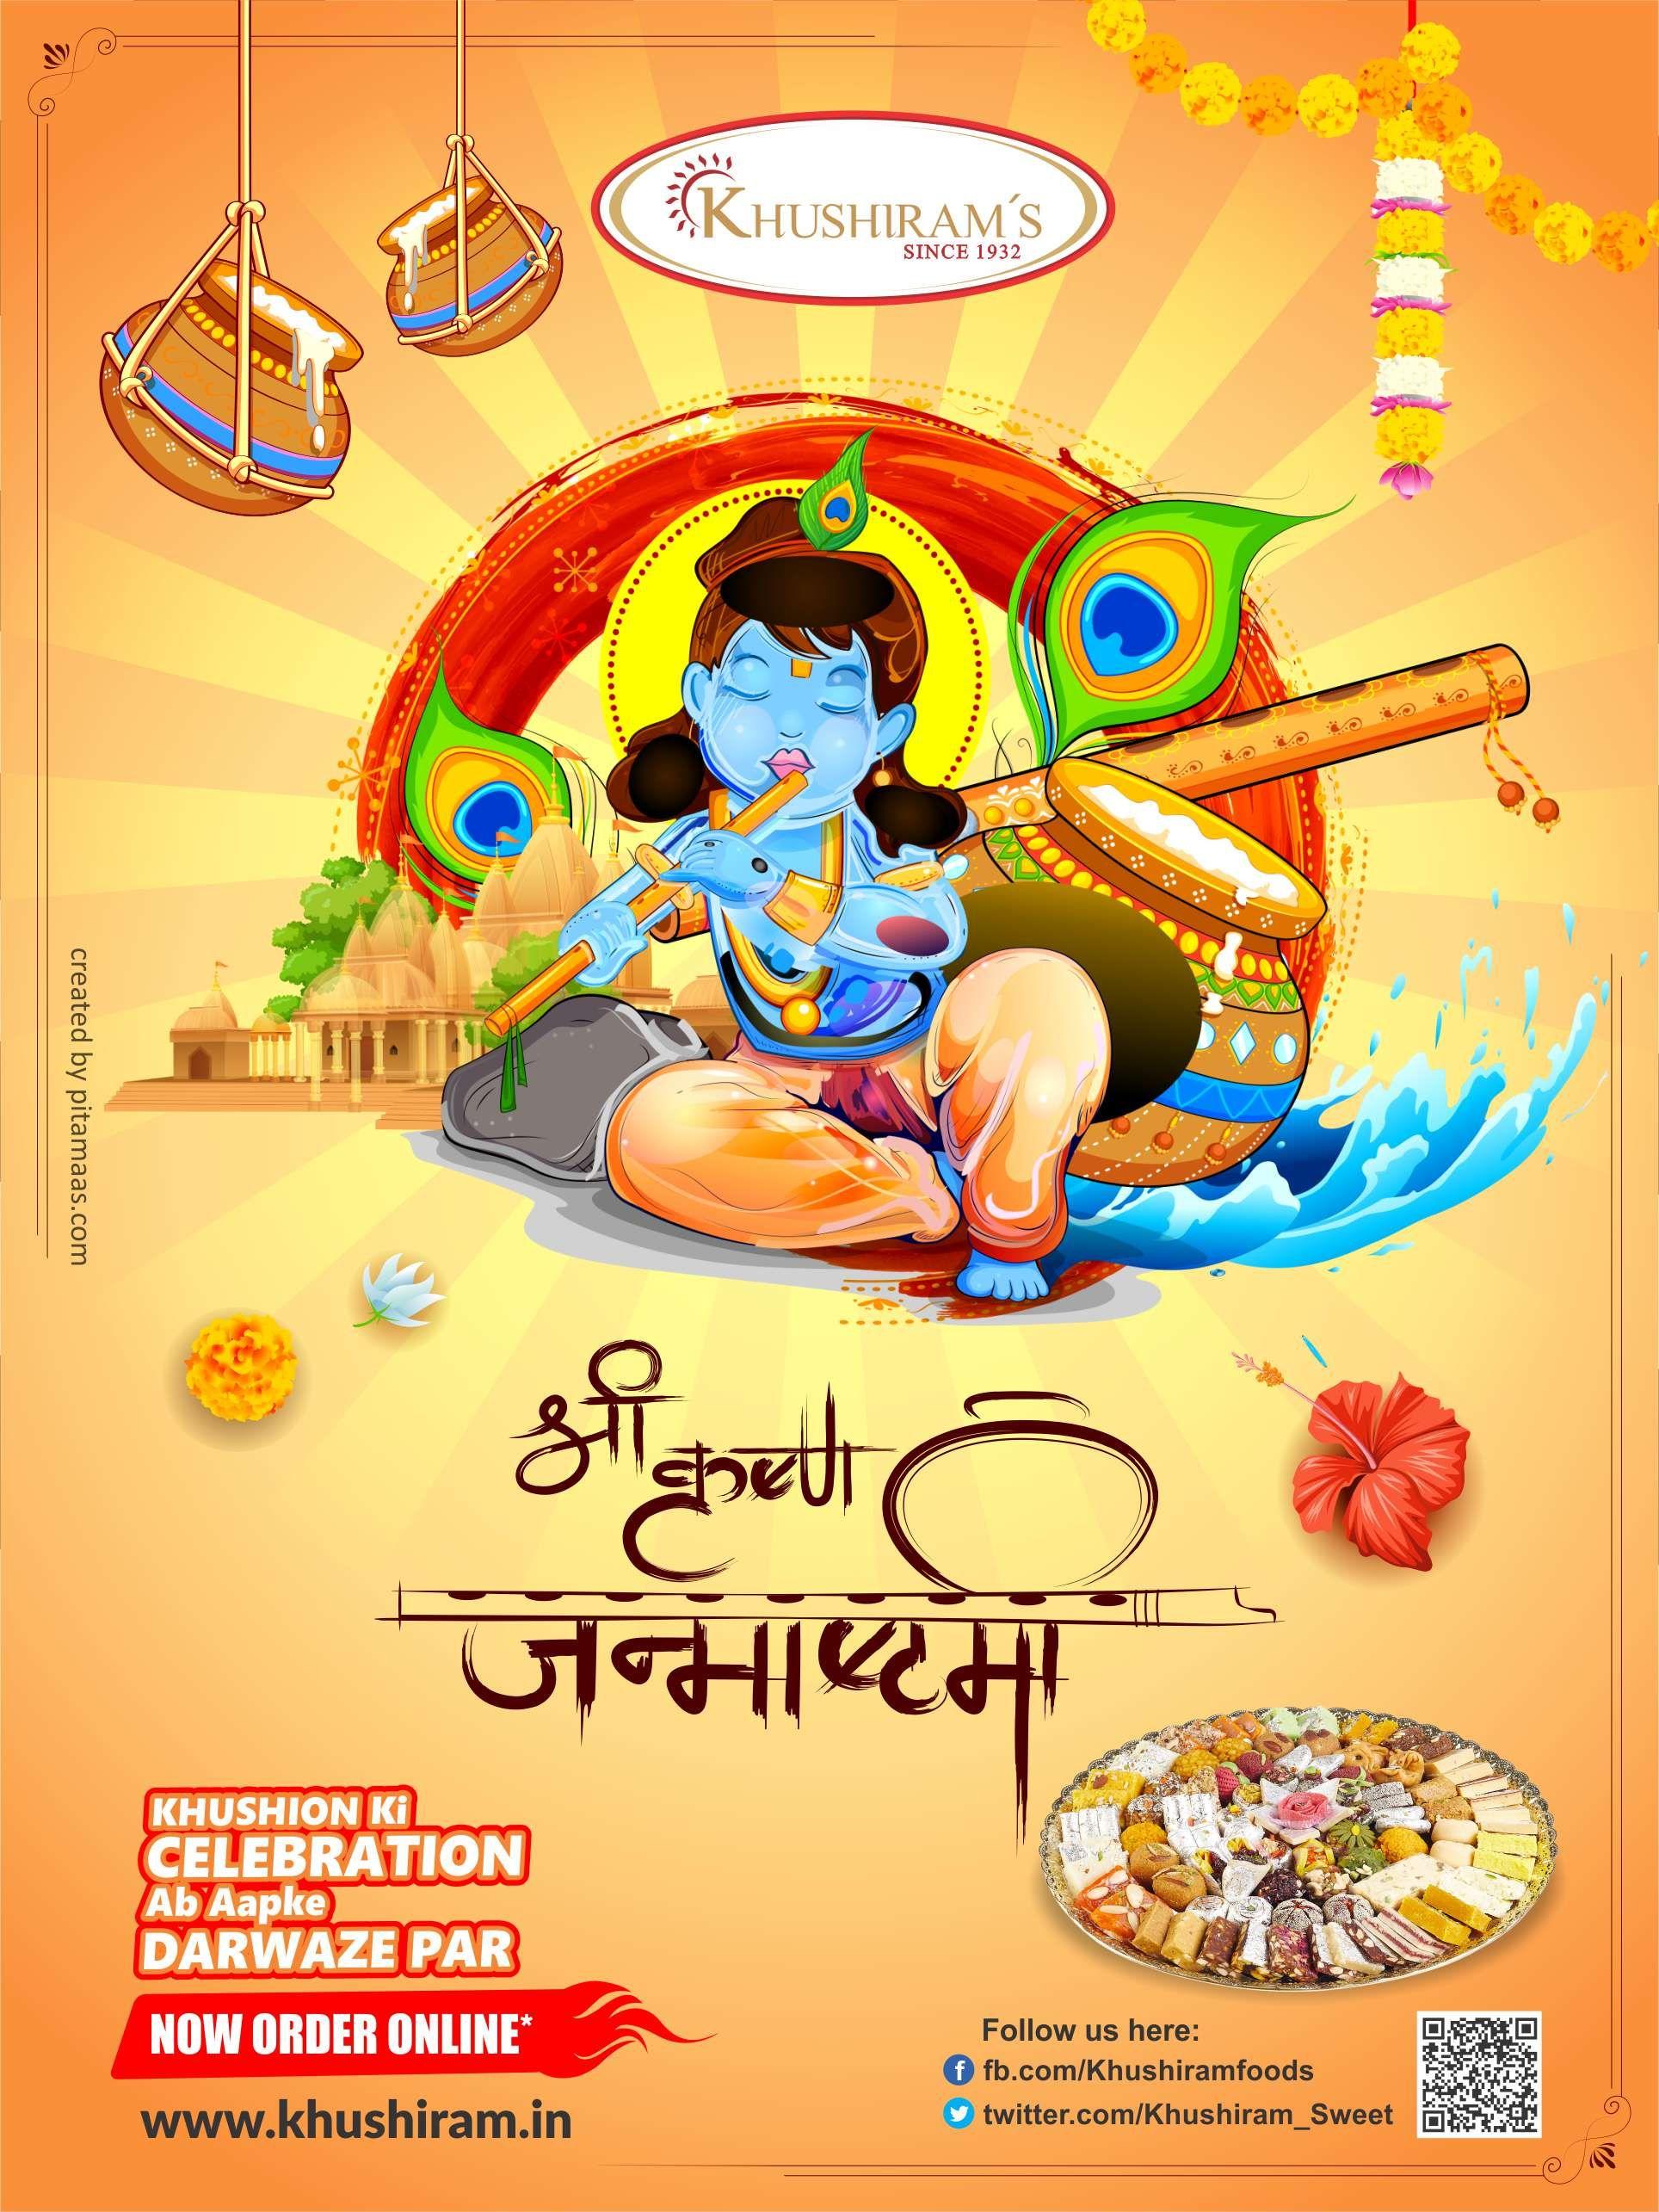 celebrate the happiness of krishna janmashtami with